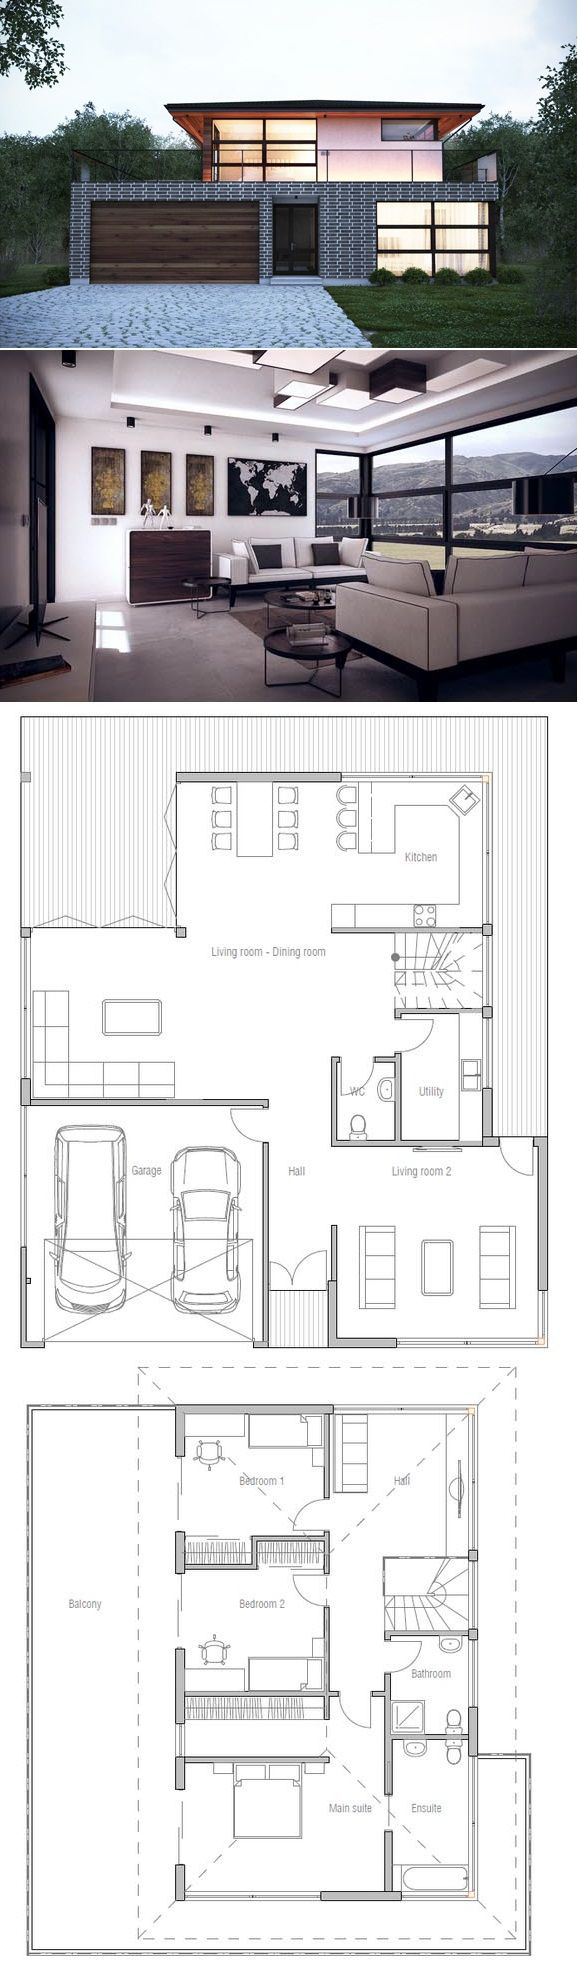 Hauspläne modern  Hausplan, TOP 20 Hauspläne | Grundrisse | Pinterest | House ...